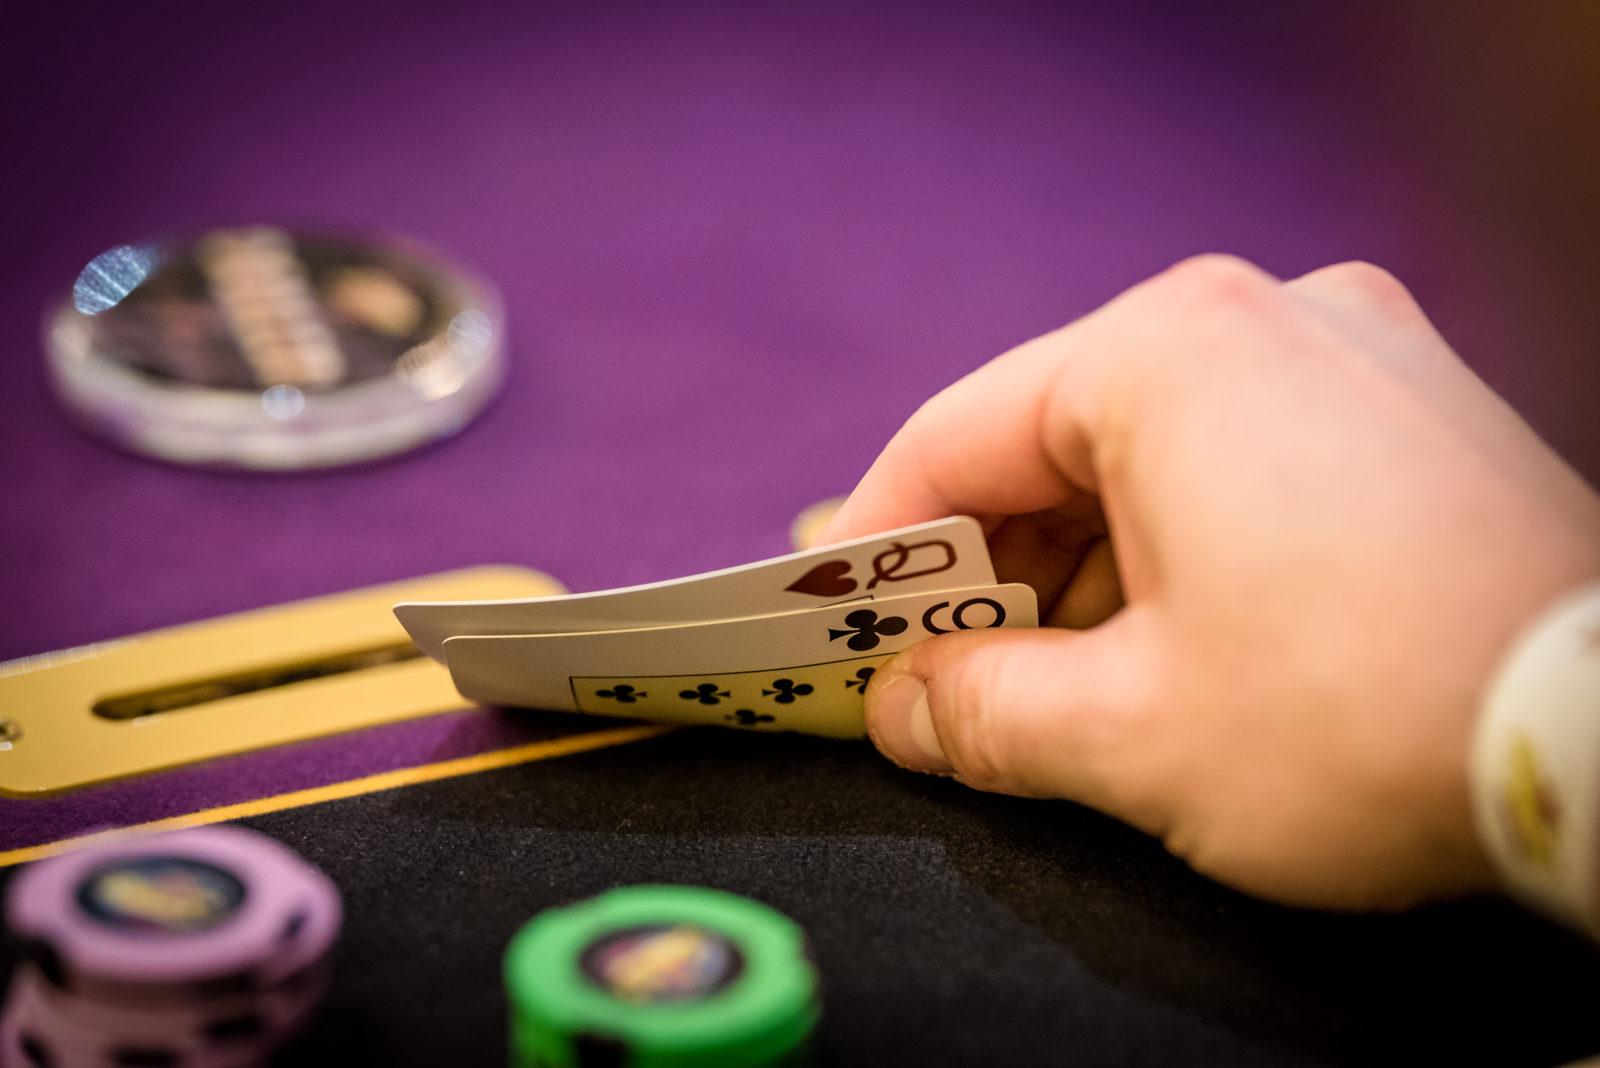 Hrac pokeru kouka na karty pred tim nez rekne all in